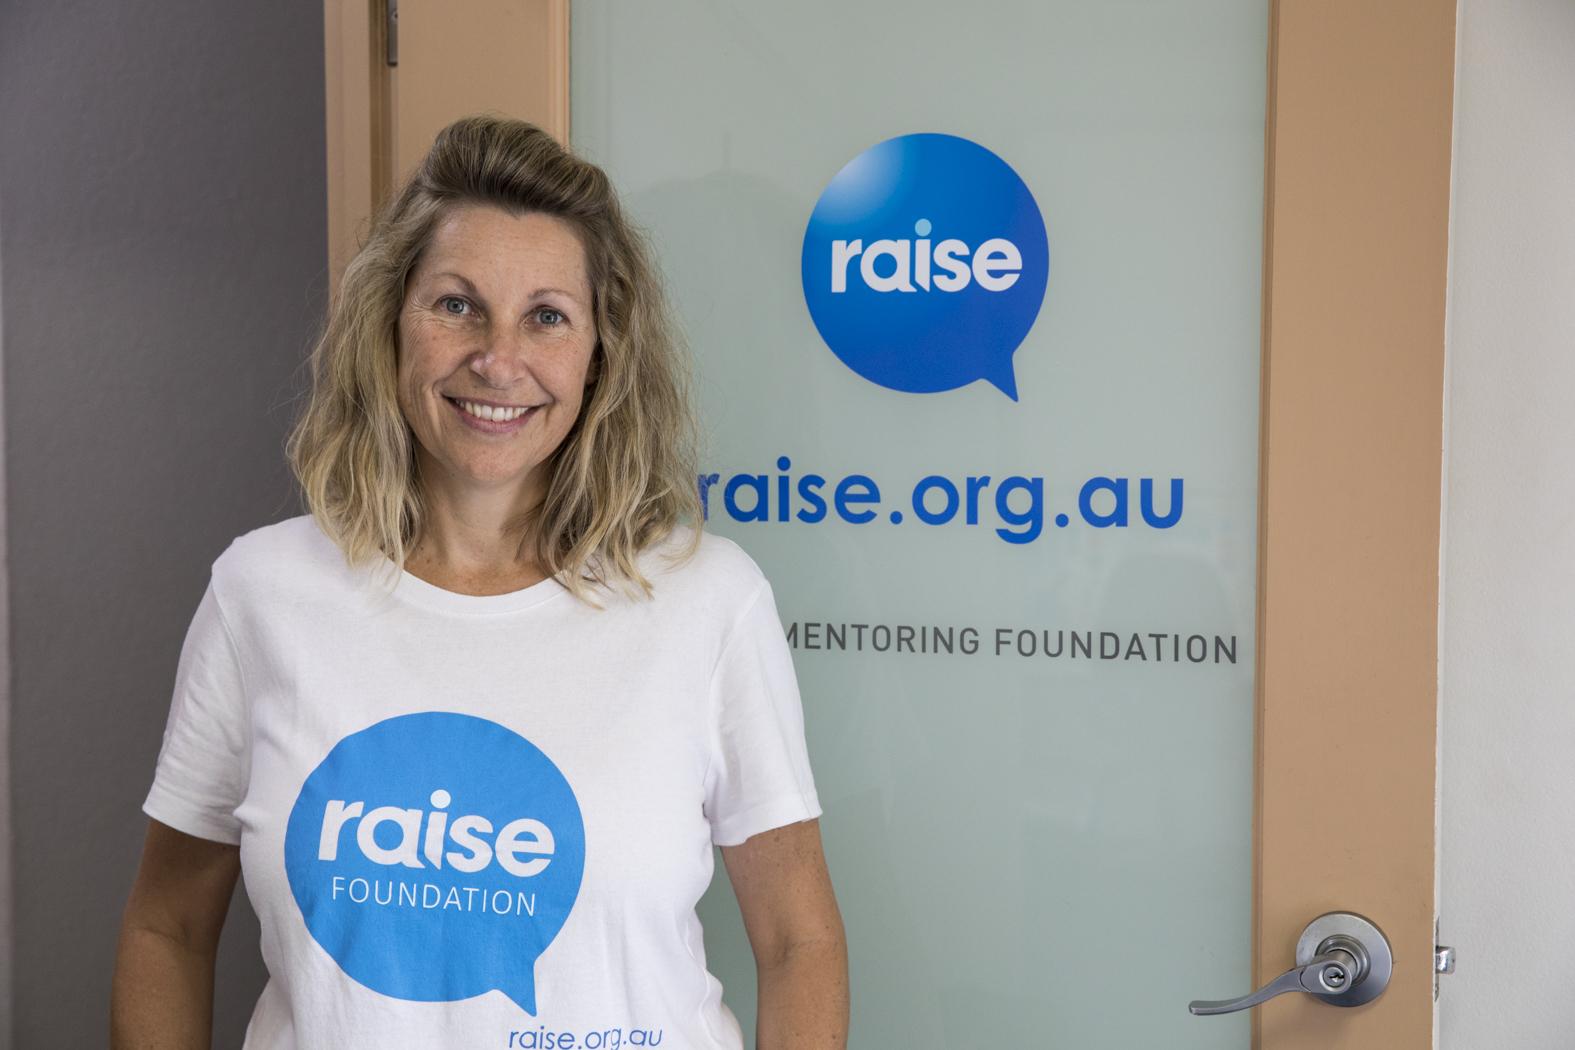 Vicki Condon in CEO of Mosman charity Raise Foundation.